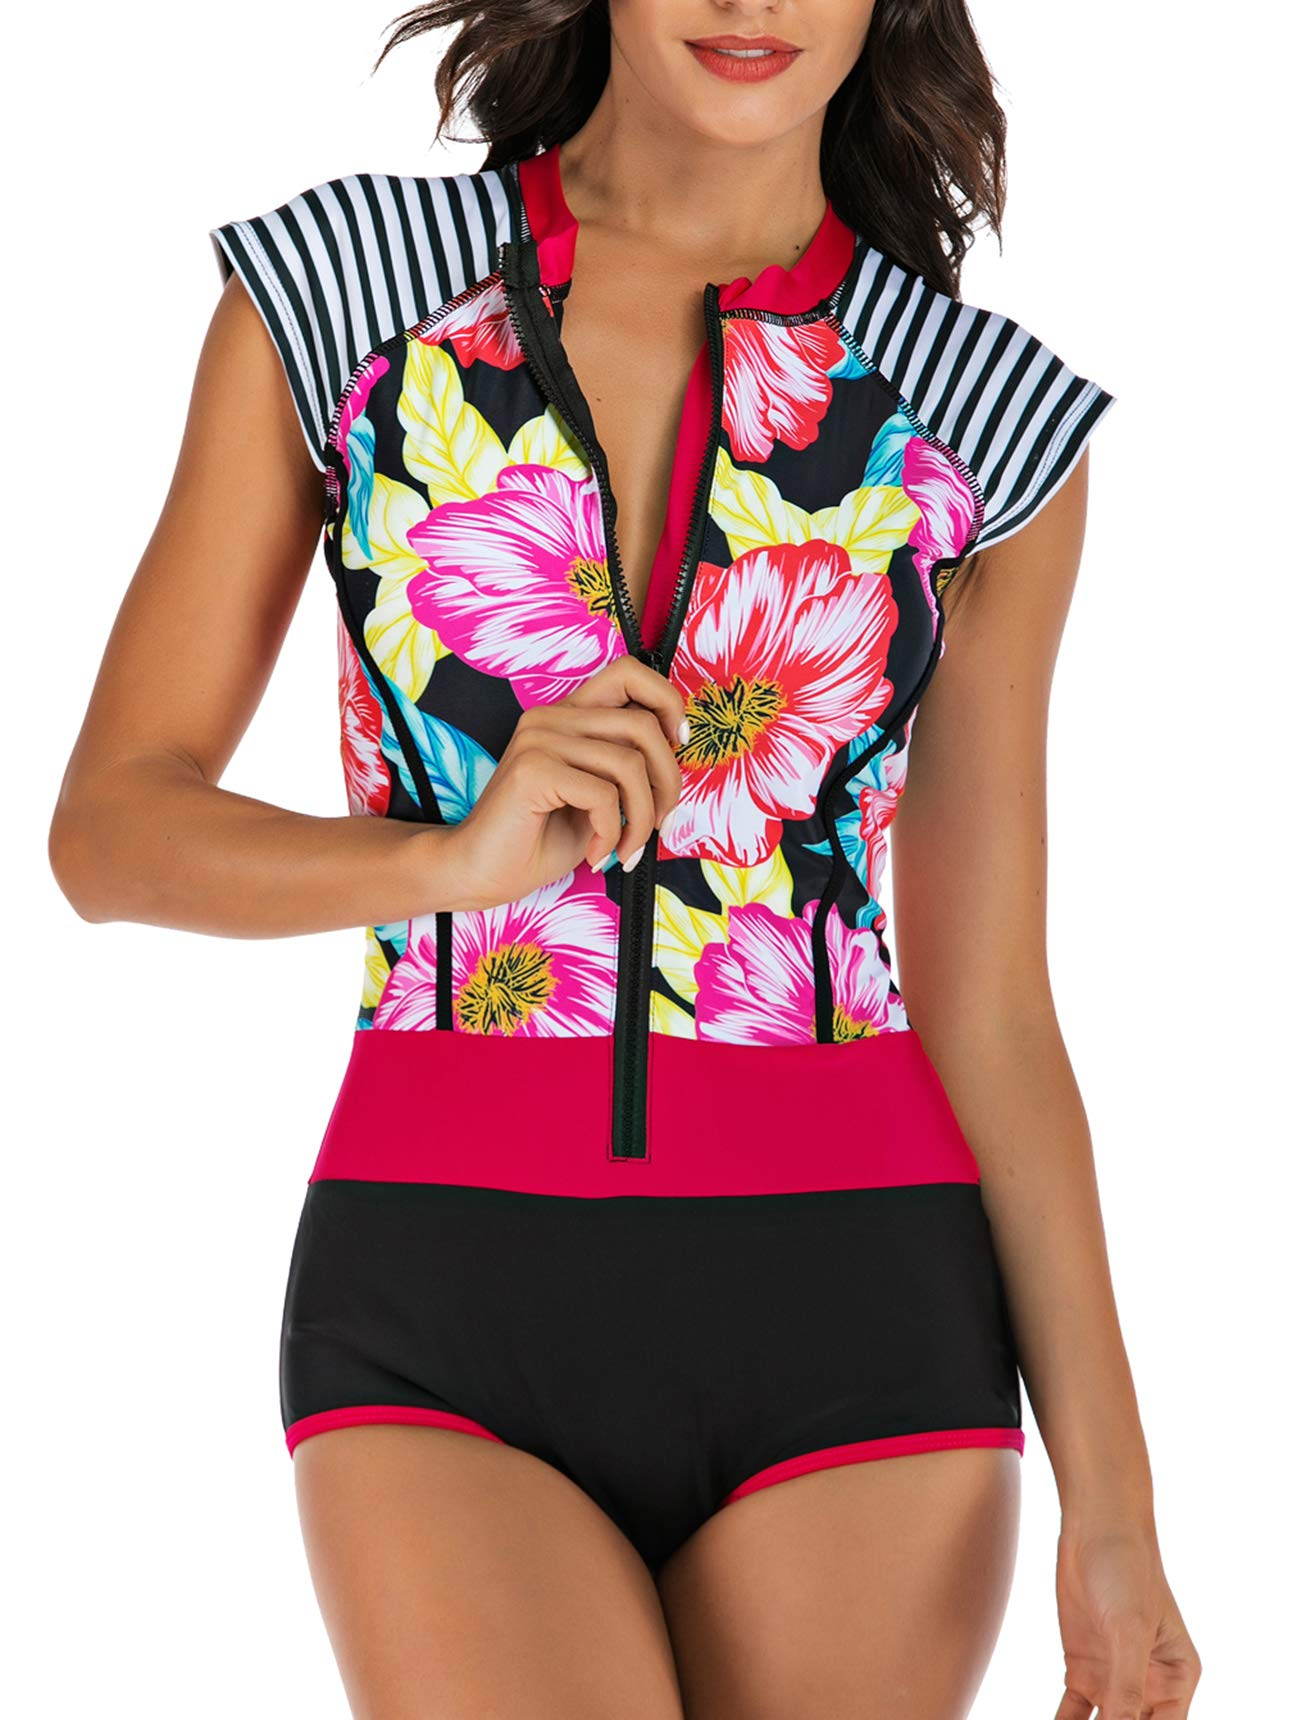 CPUTAN Women's Rashguard Long Sleeve Zip Swimsuit Print Surfing one Piece Swimwear